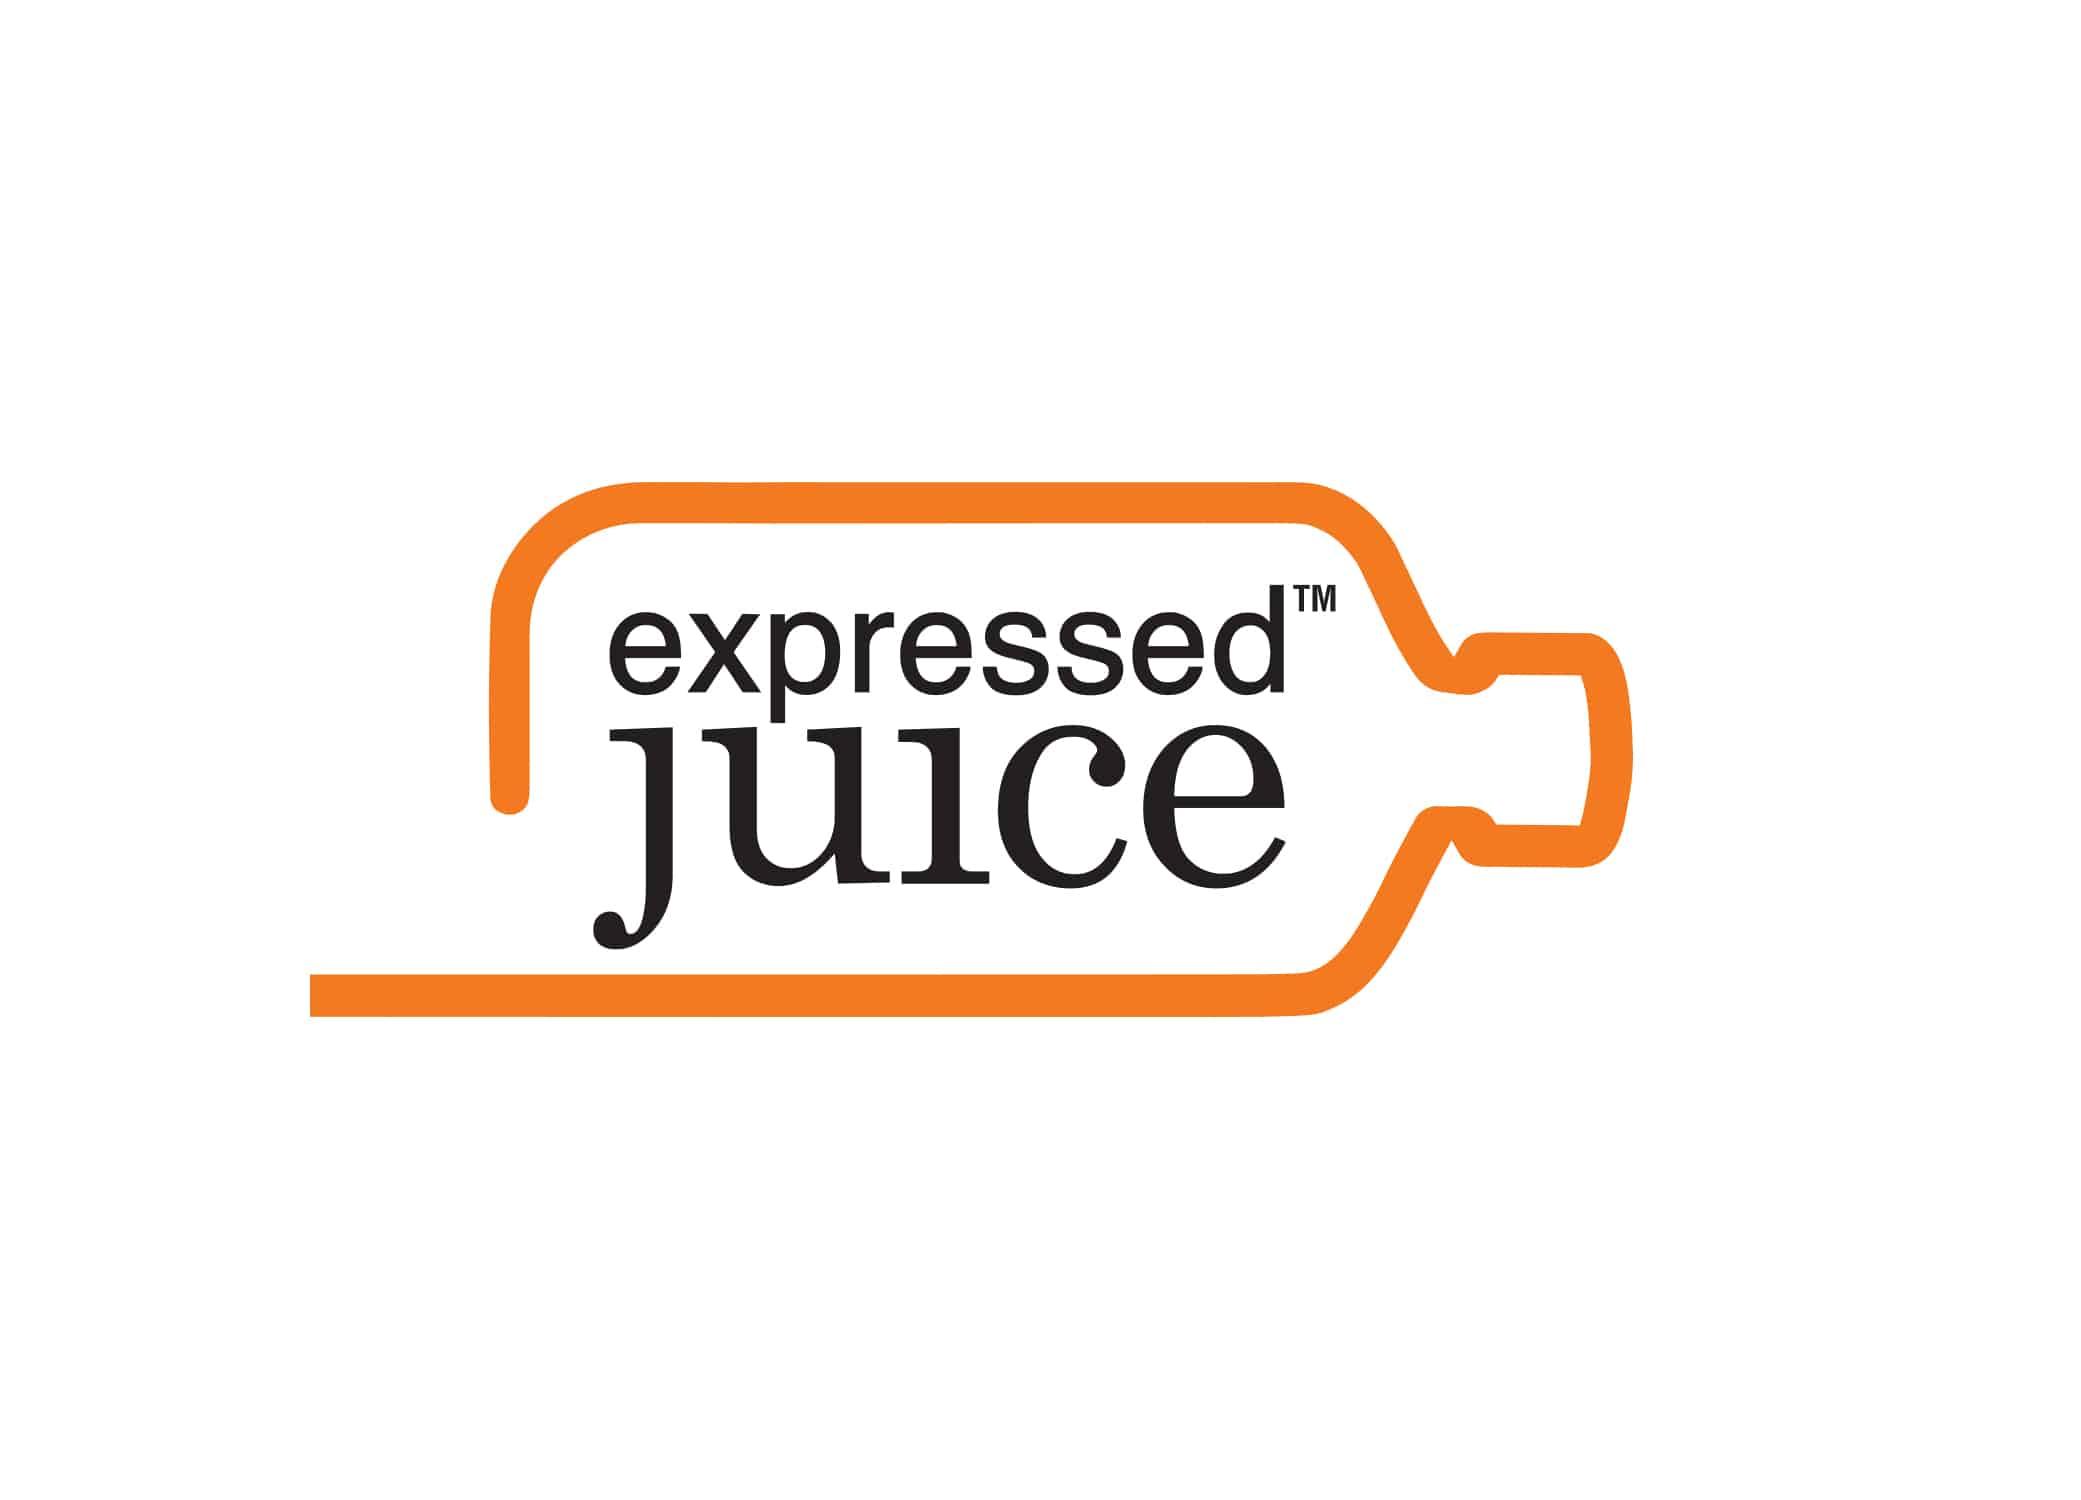 Expressed_Juice_Brand_Identity_Design